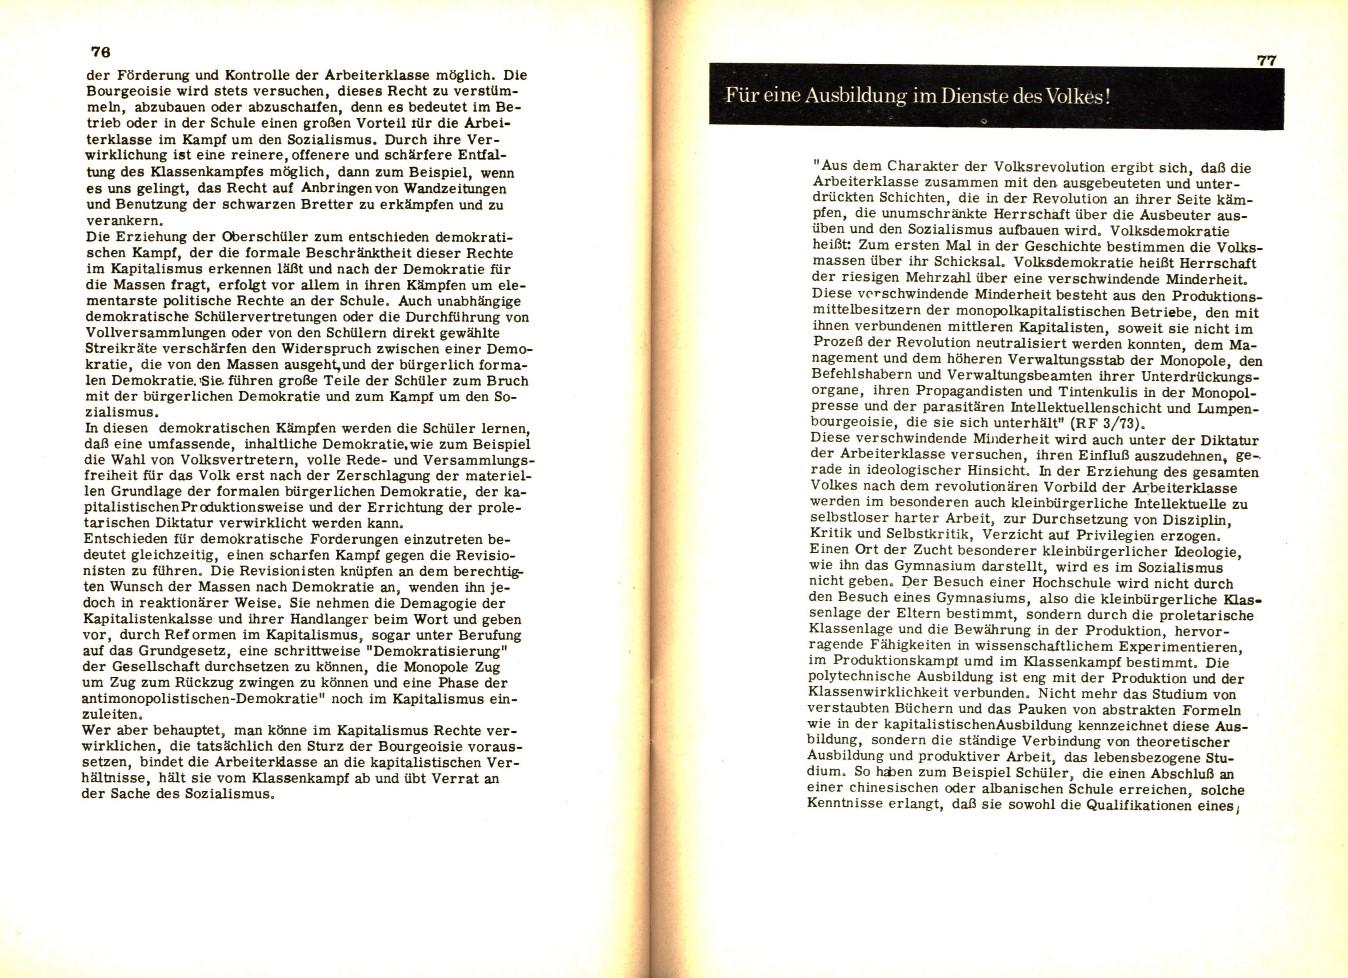 KOV_1973_Aktionsprogramm_41